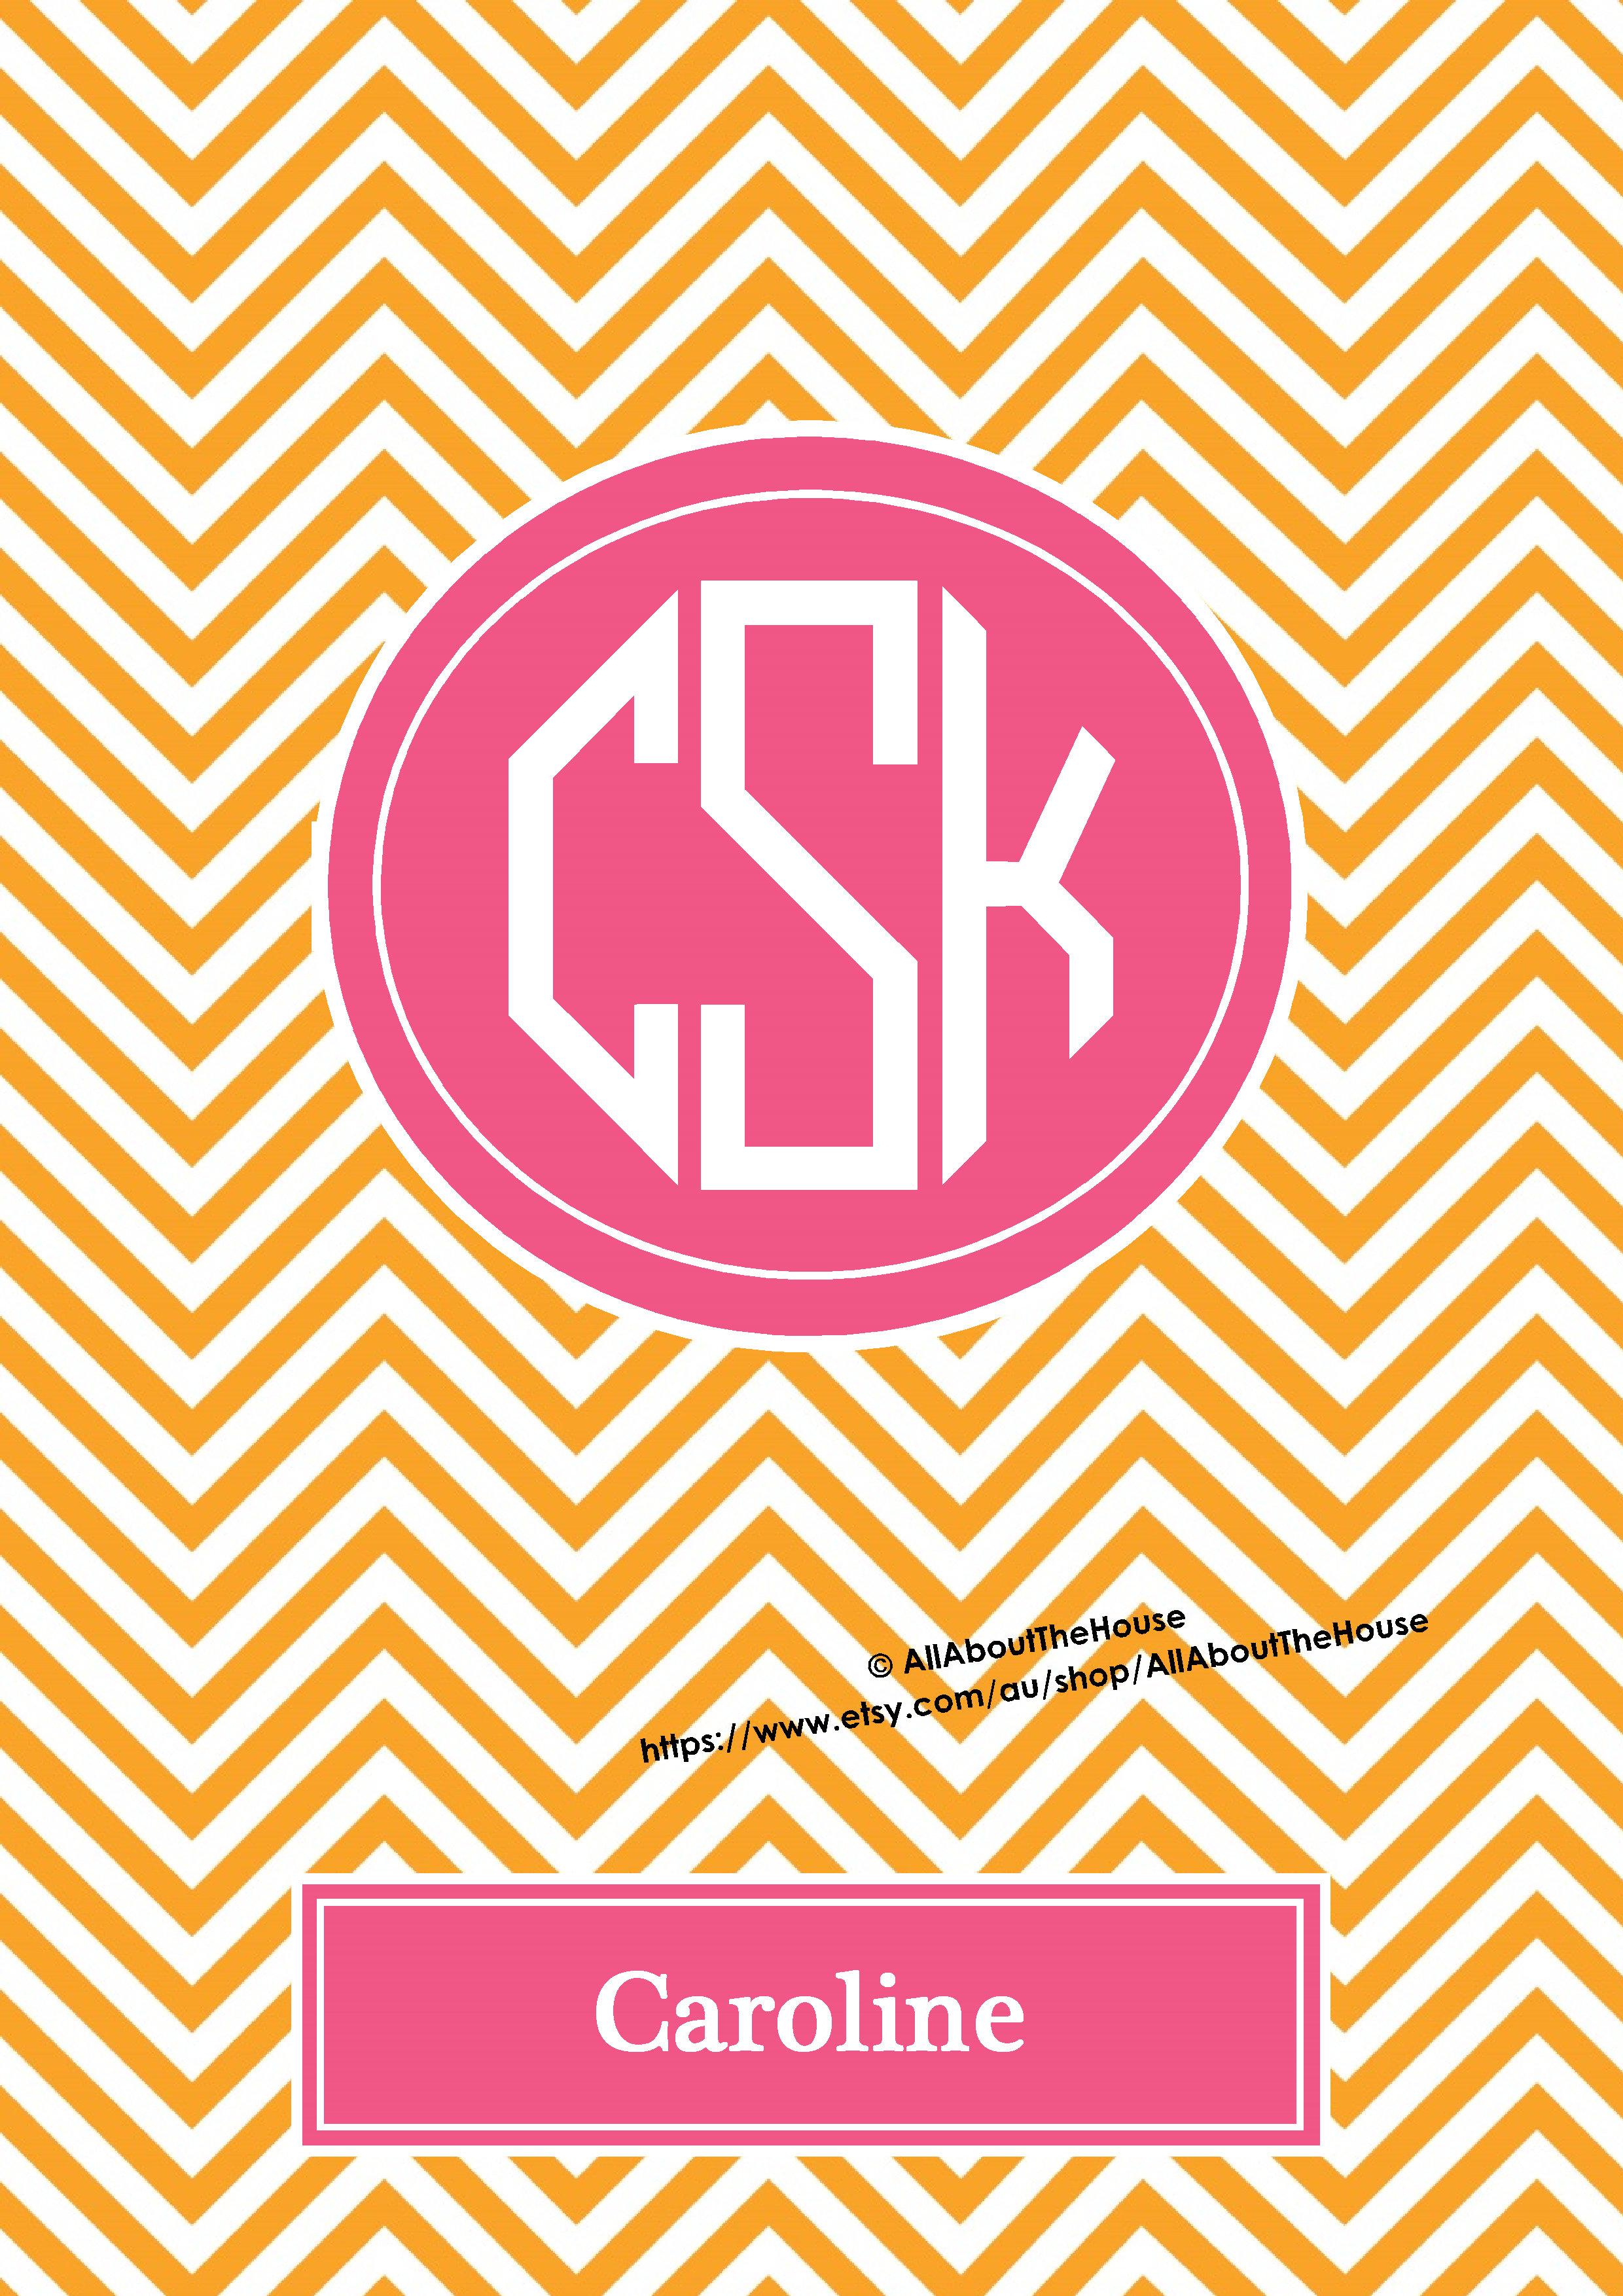 https://www.etsy.com/au/listing/164593229/printable-chevron-binder-cover-spine